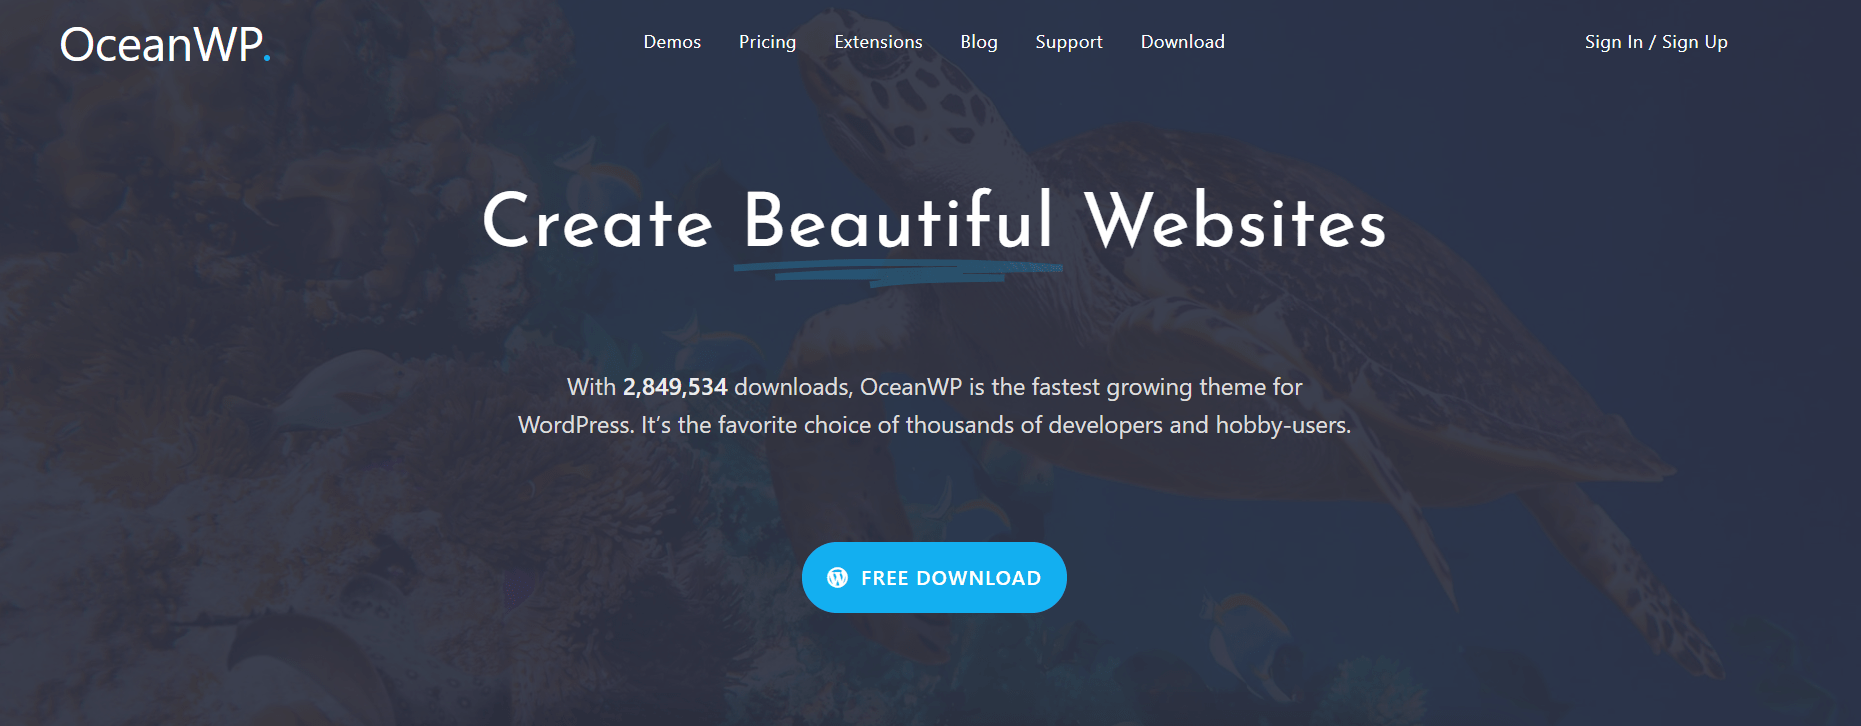 WordPress Multi-purpose themes - OceanWP Theme